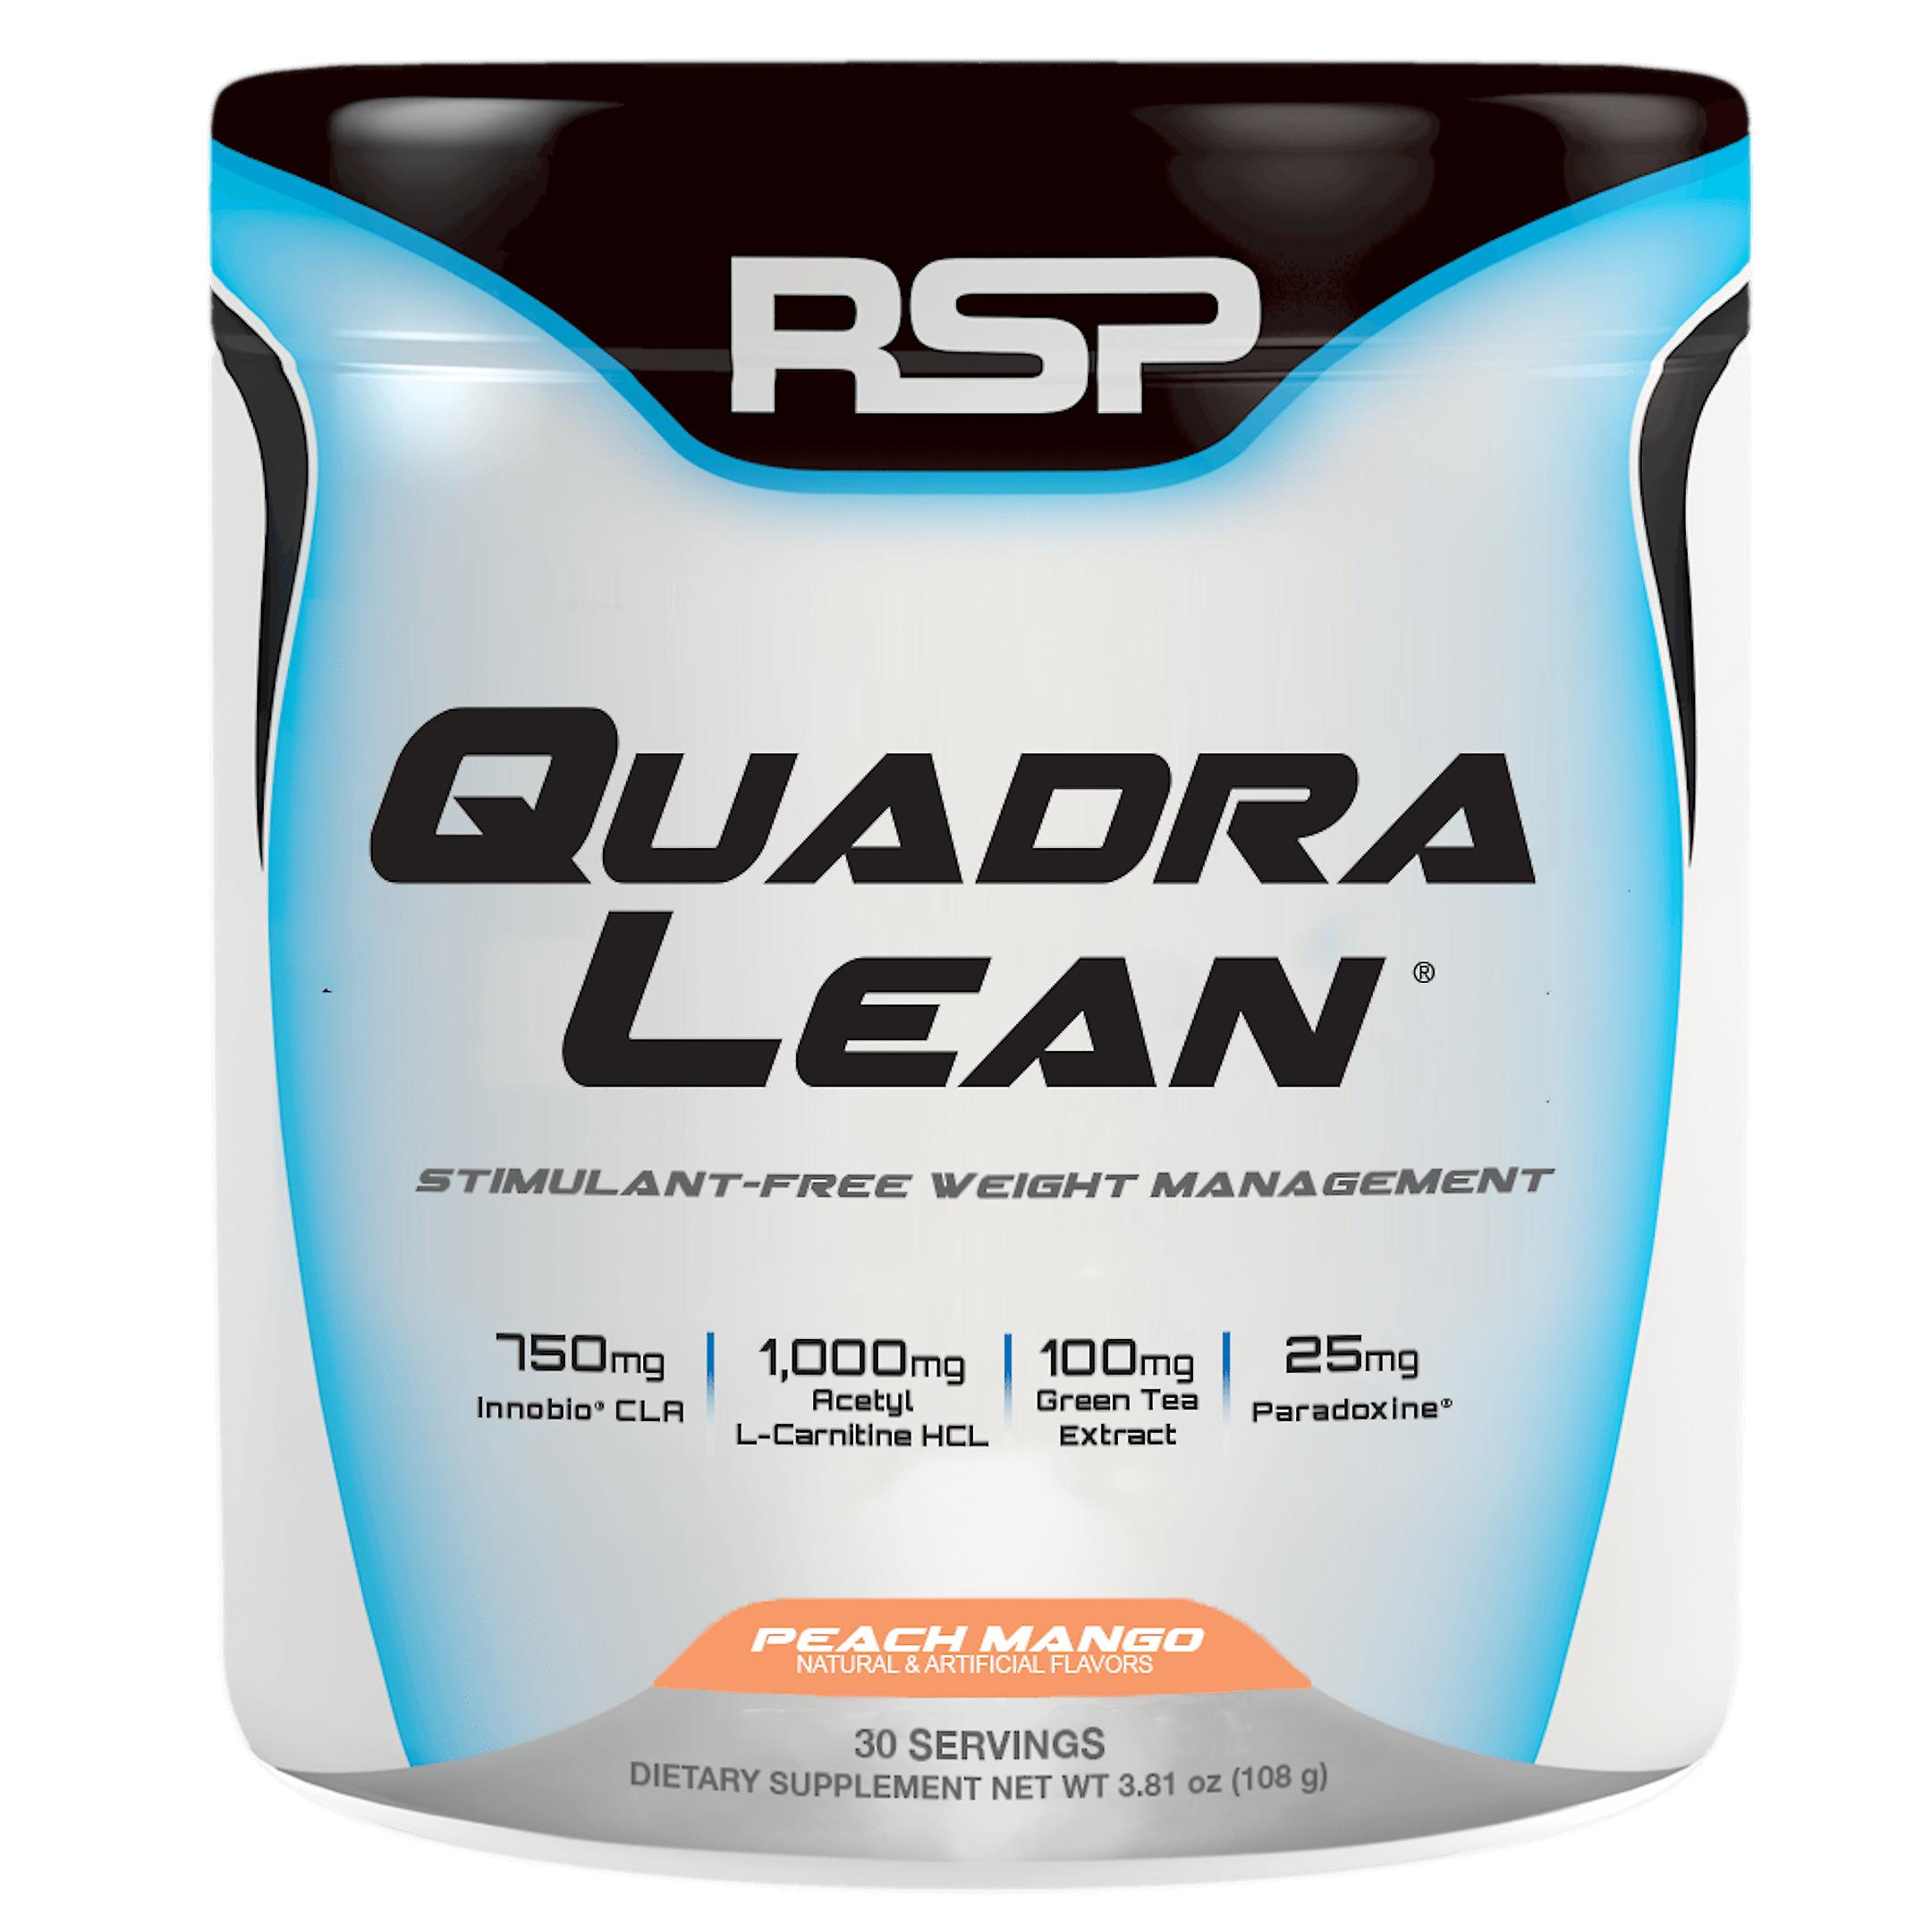 Rsp quadralean powder, fat burner, metabolism booster, stimulant free (peach mango, 30 servings)